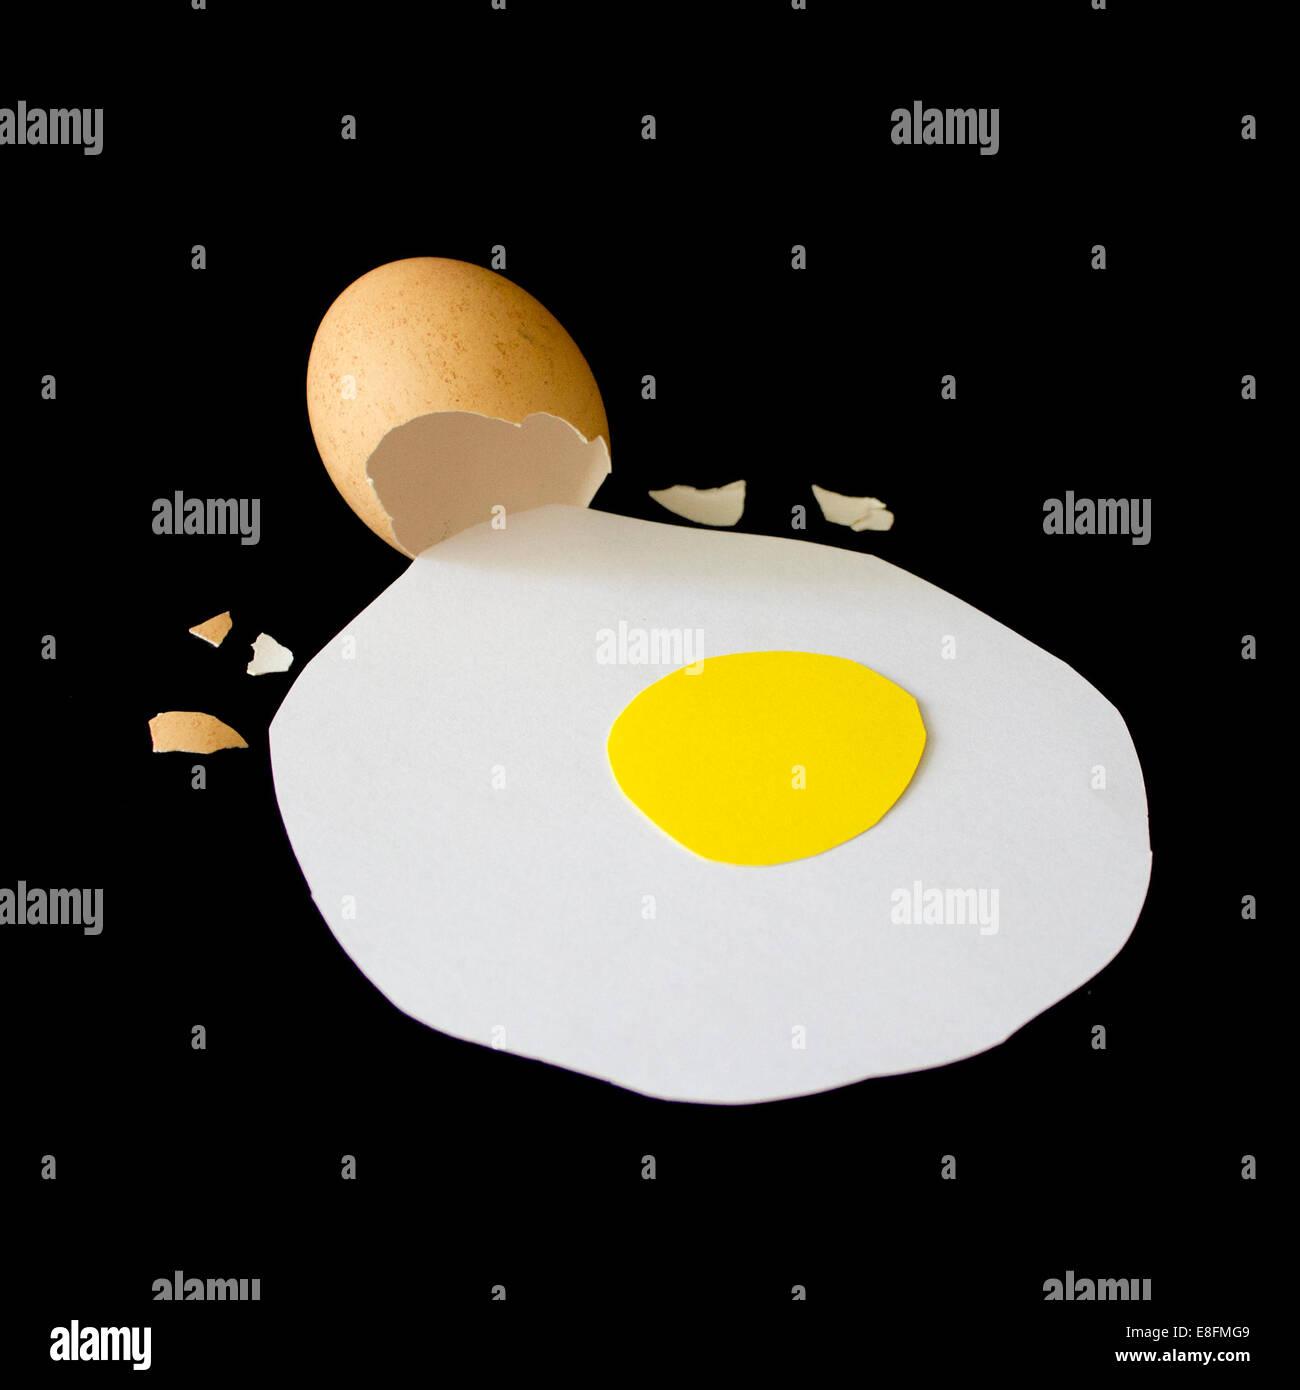 Conceptual cracked egg - Stock Image